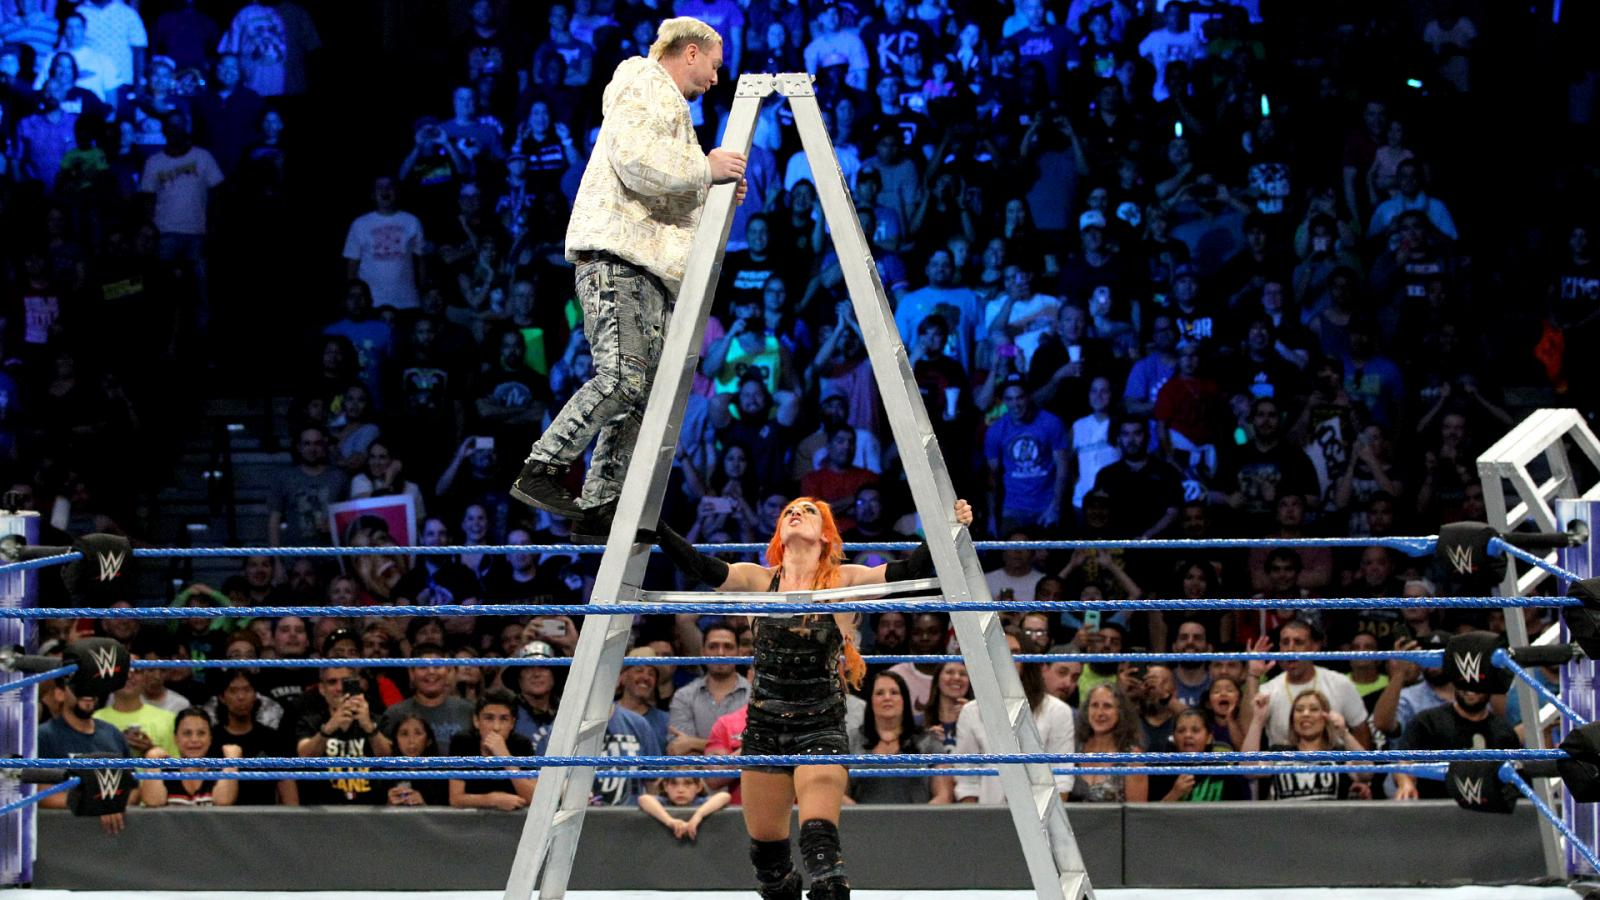 WWE SmackDown रिजल्ट्स : 28 जून 2017 : महिला मनी इन द बैंक का आख़िरकार हुआ फैसला 19